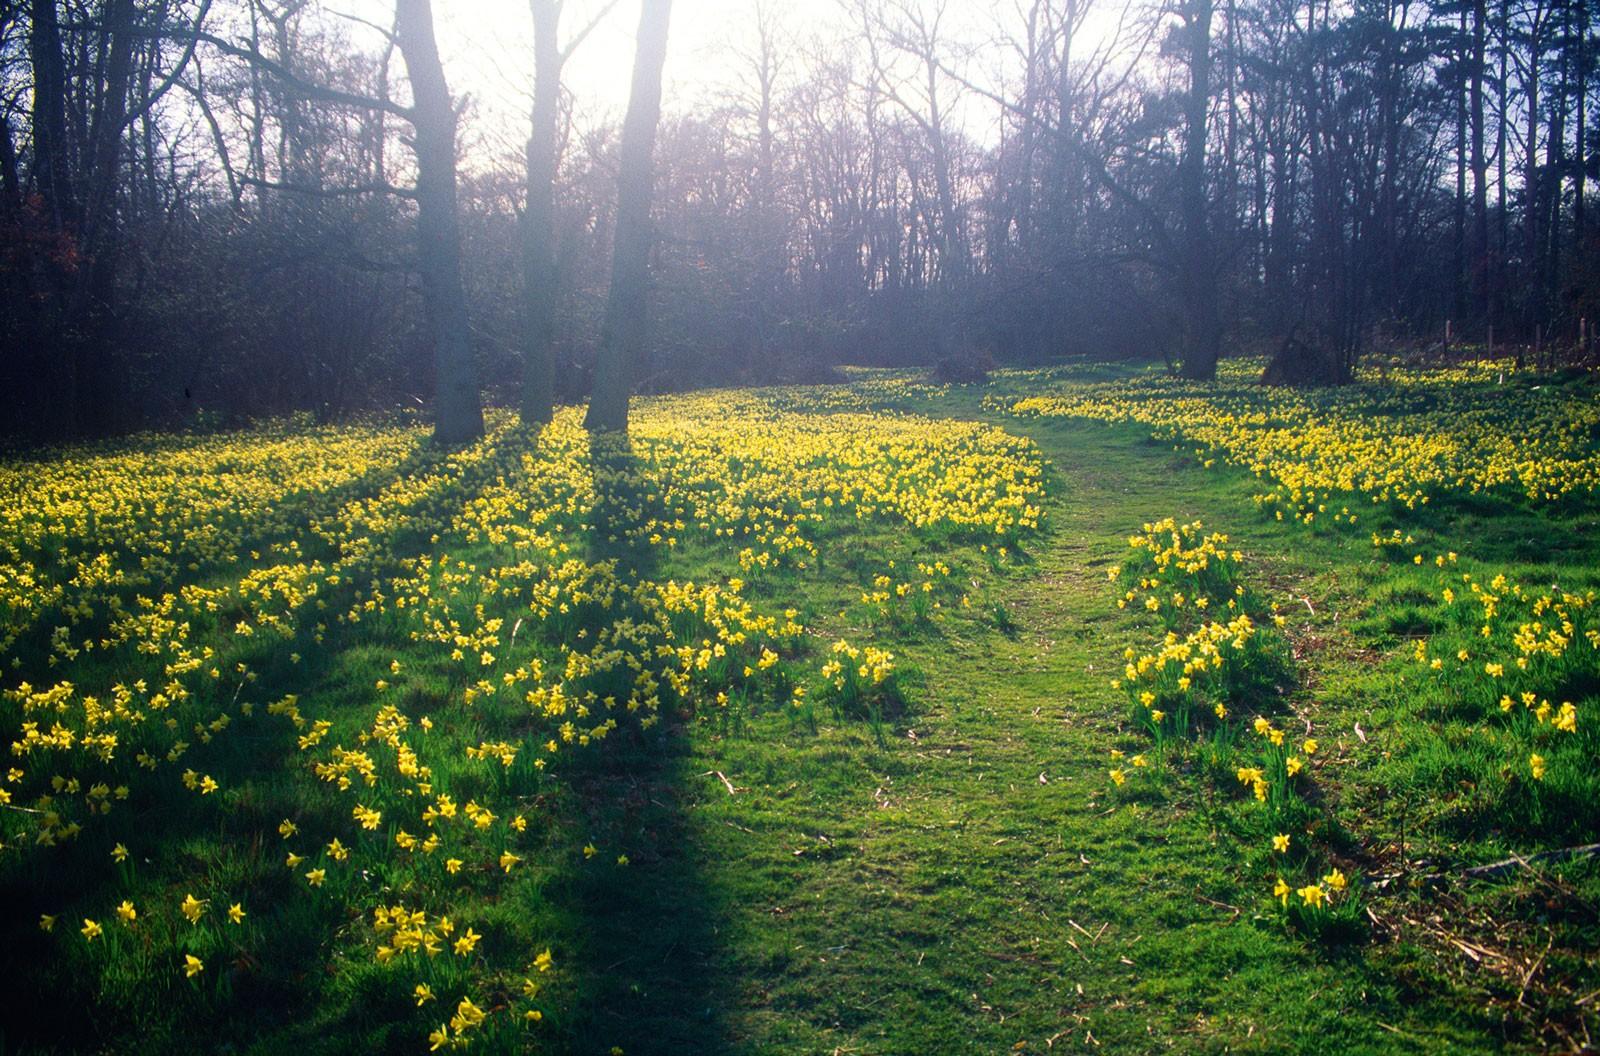 daffodil-butley-suffolk-888d330